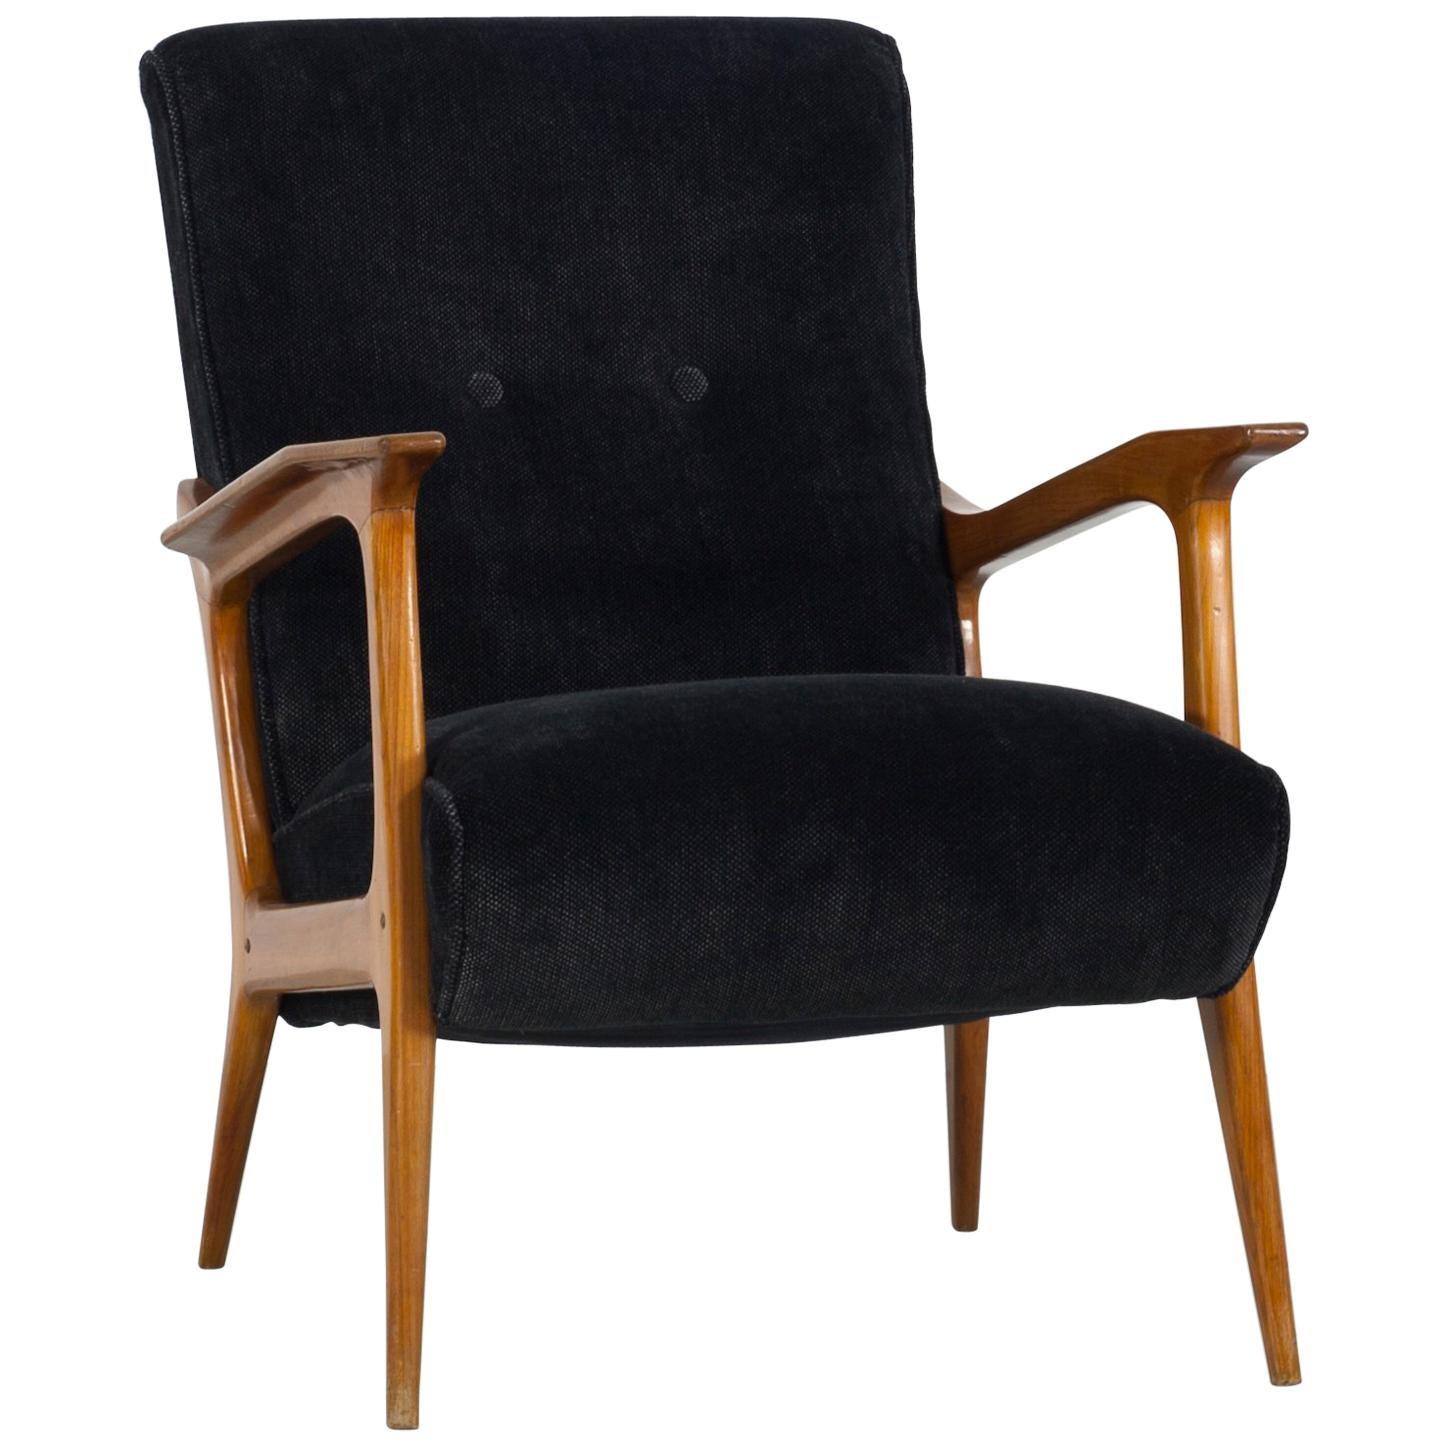 Italian Midcentury Wooden Accent Chair